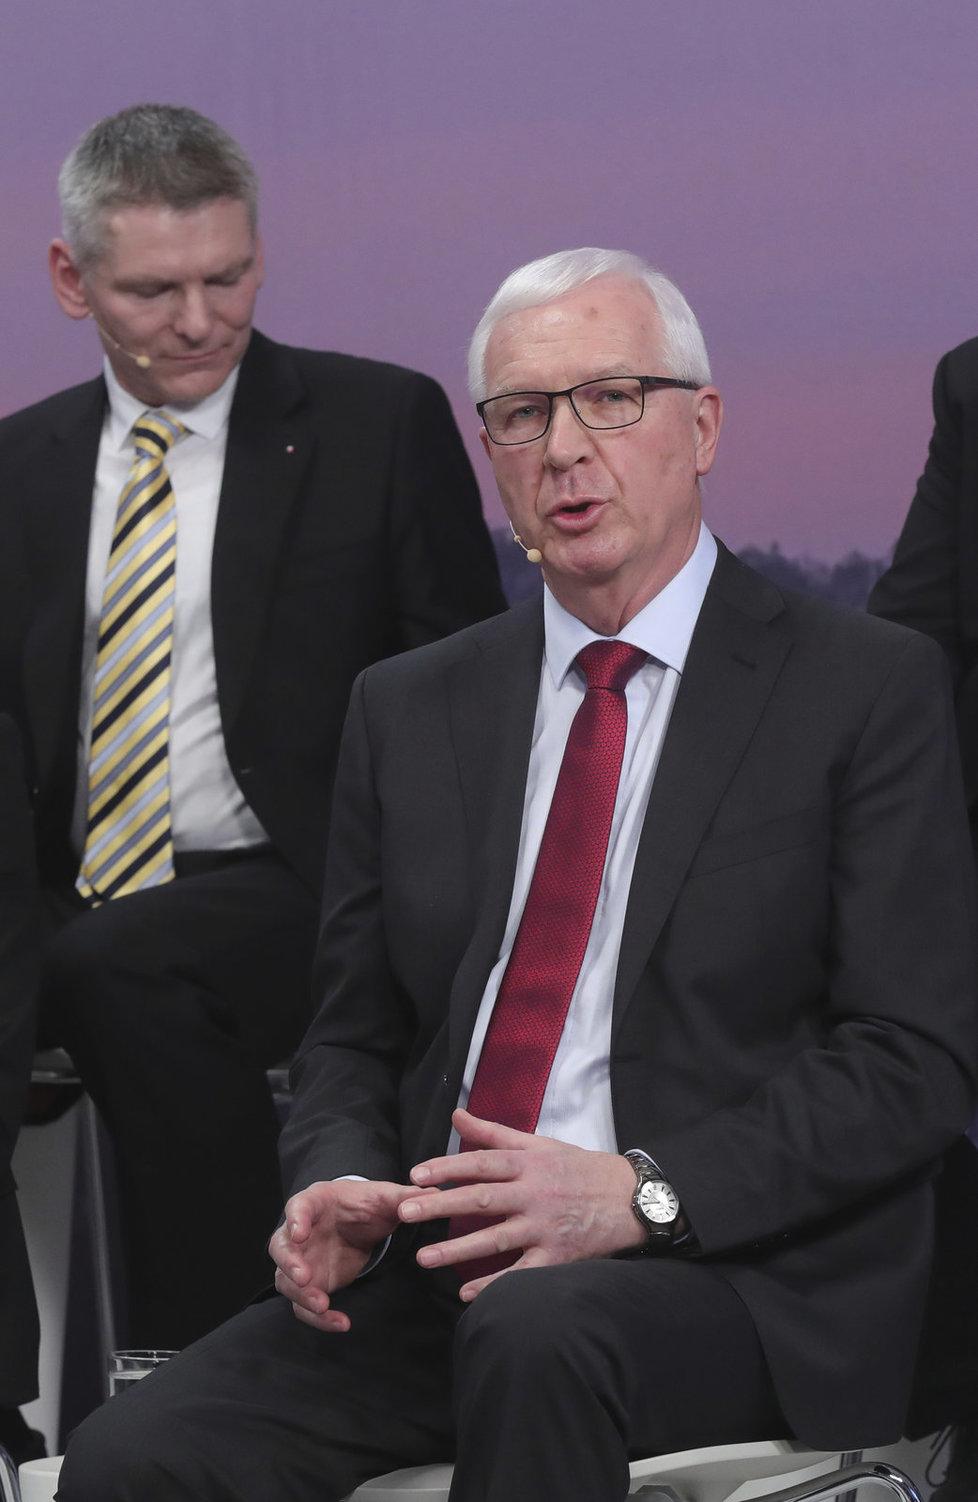 Superdebata prezidentských kandidátů: Jiří Drahoš